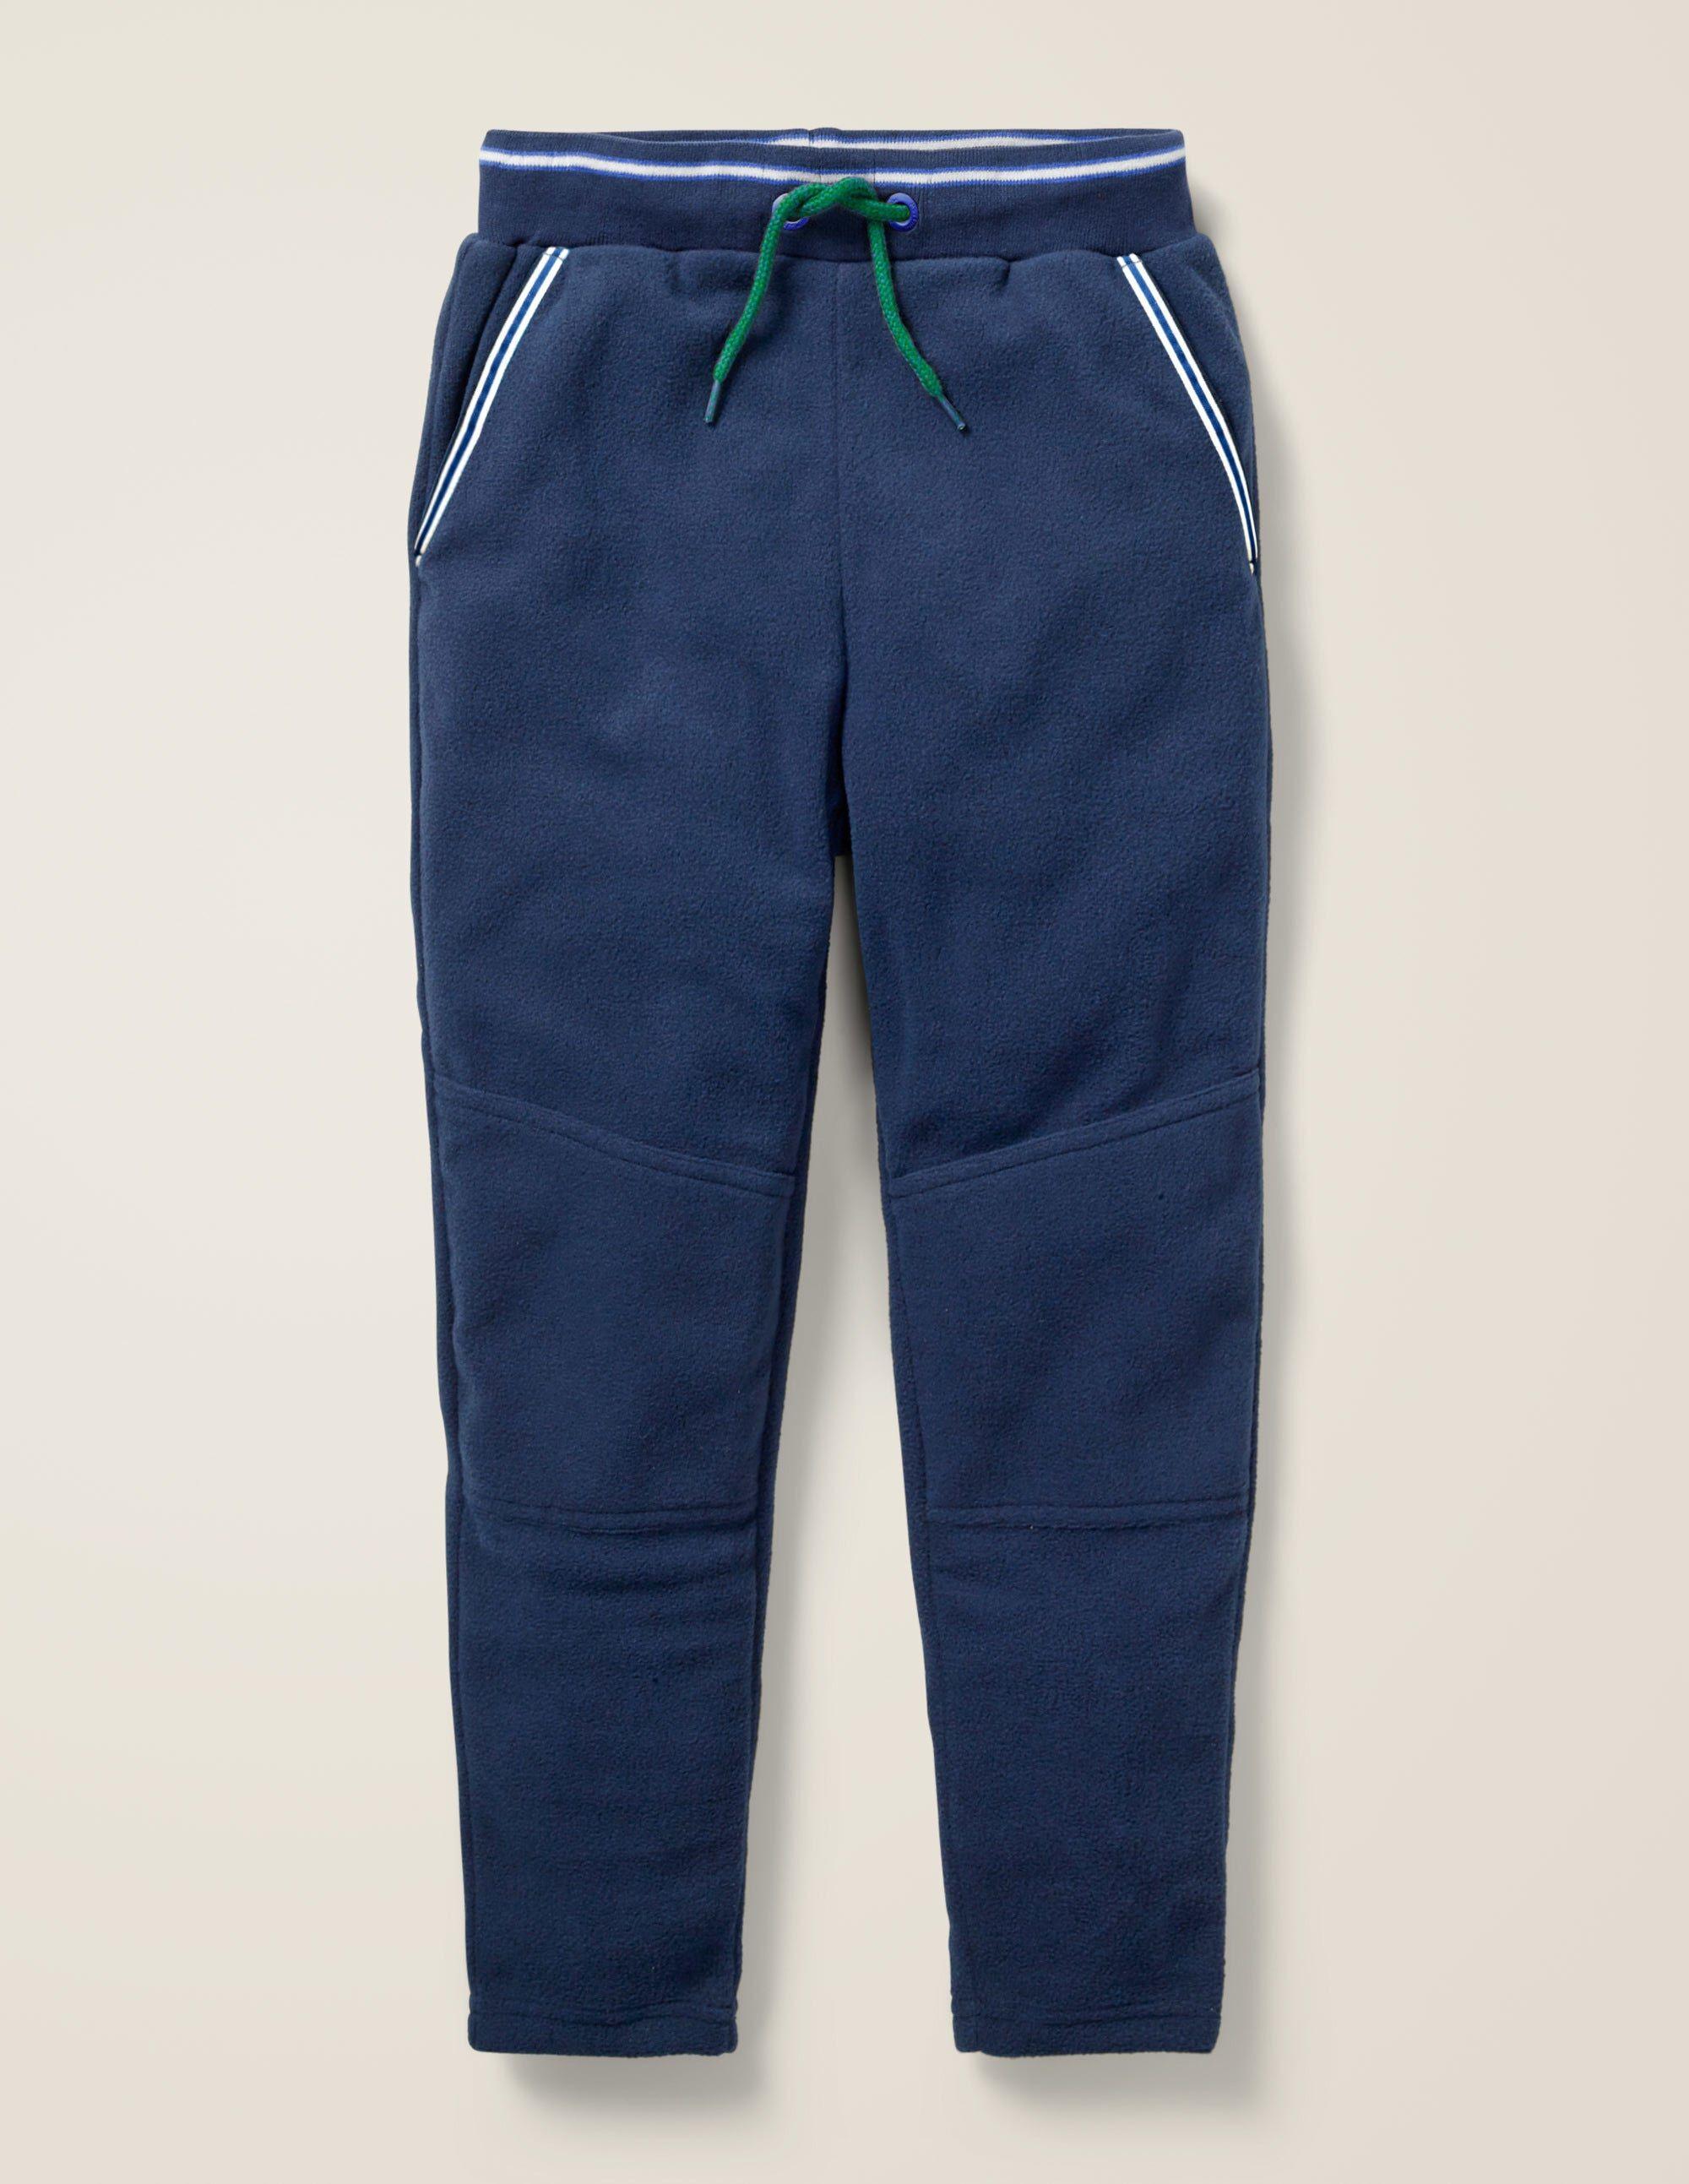 Mini Pantalon de survêtement en micro-polaire BLU Garçon Boden, Blue - 4a